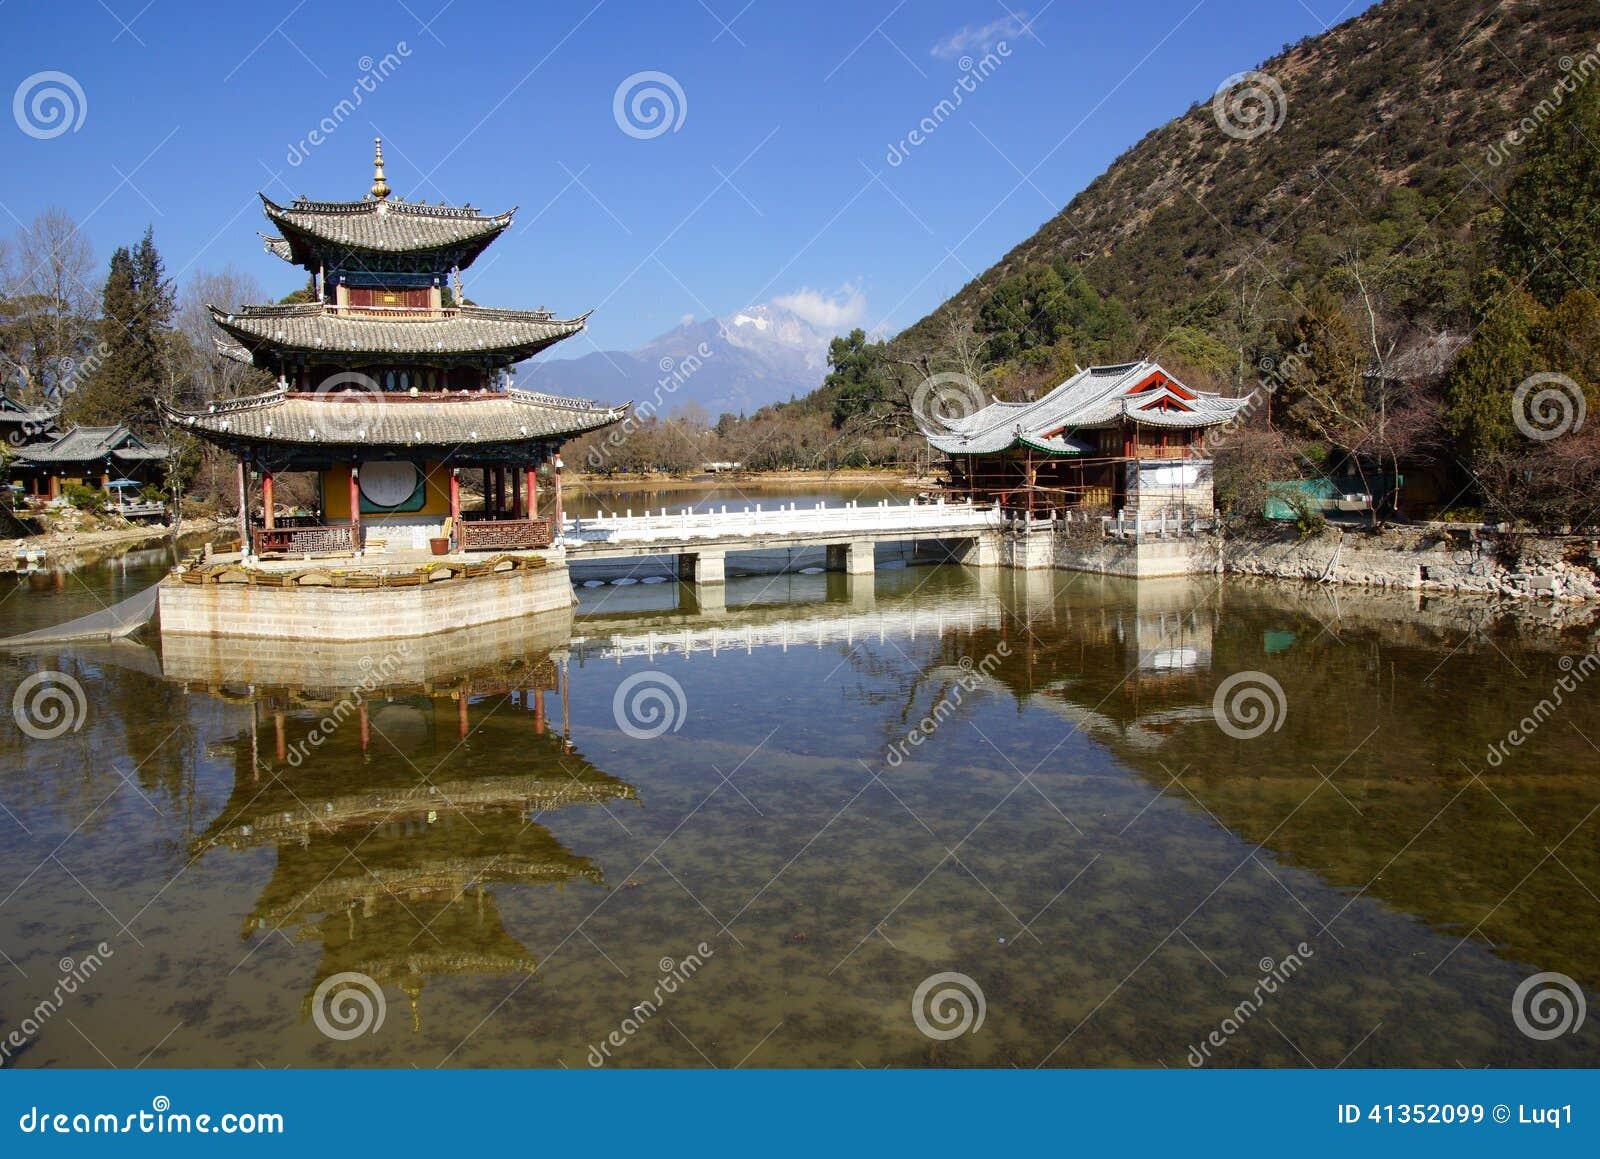 Svart Dragon Pool Jade Dragon Snow berg i Lijiang, Yunnan, Kina